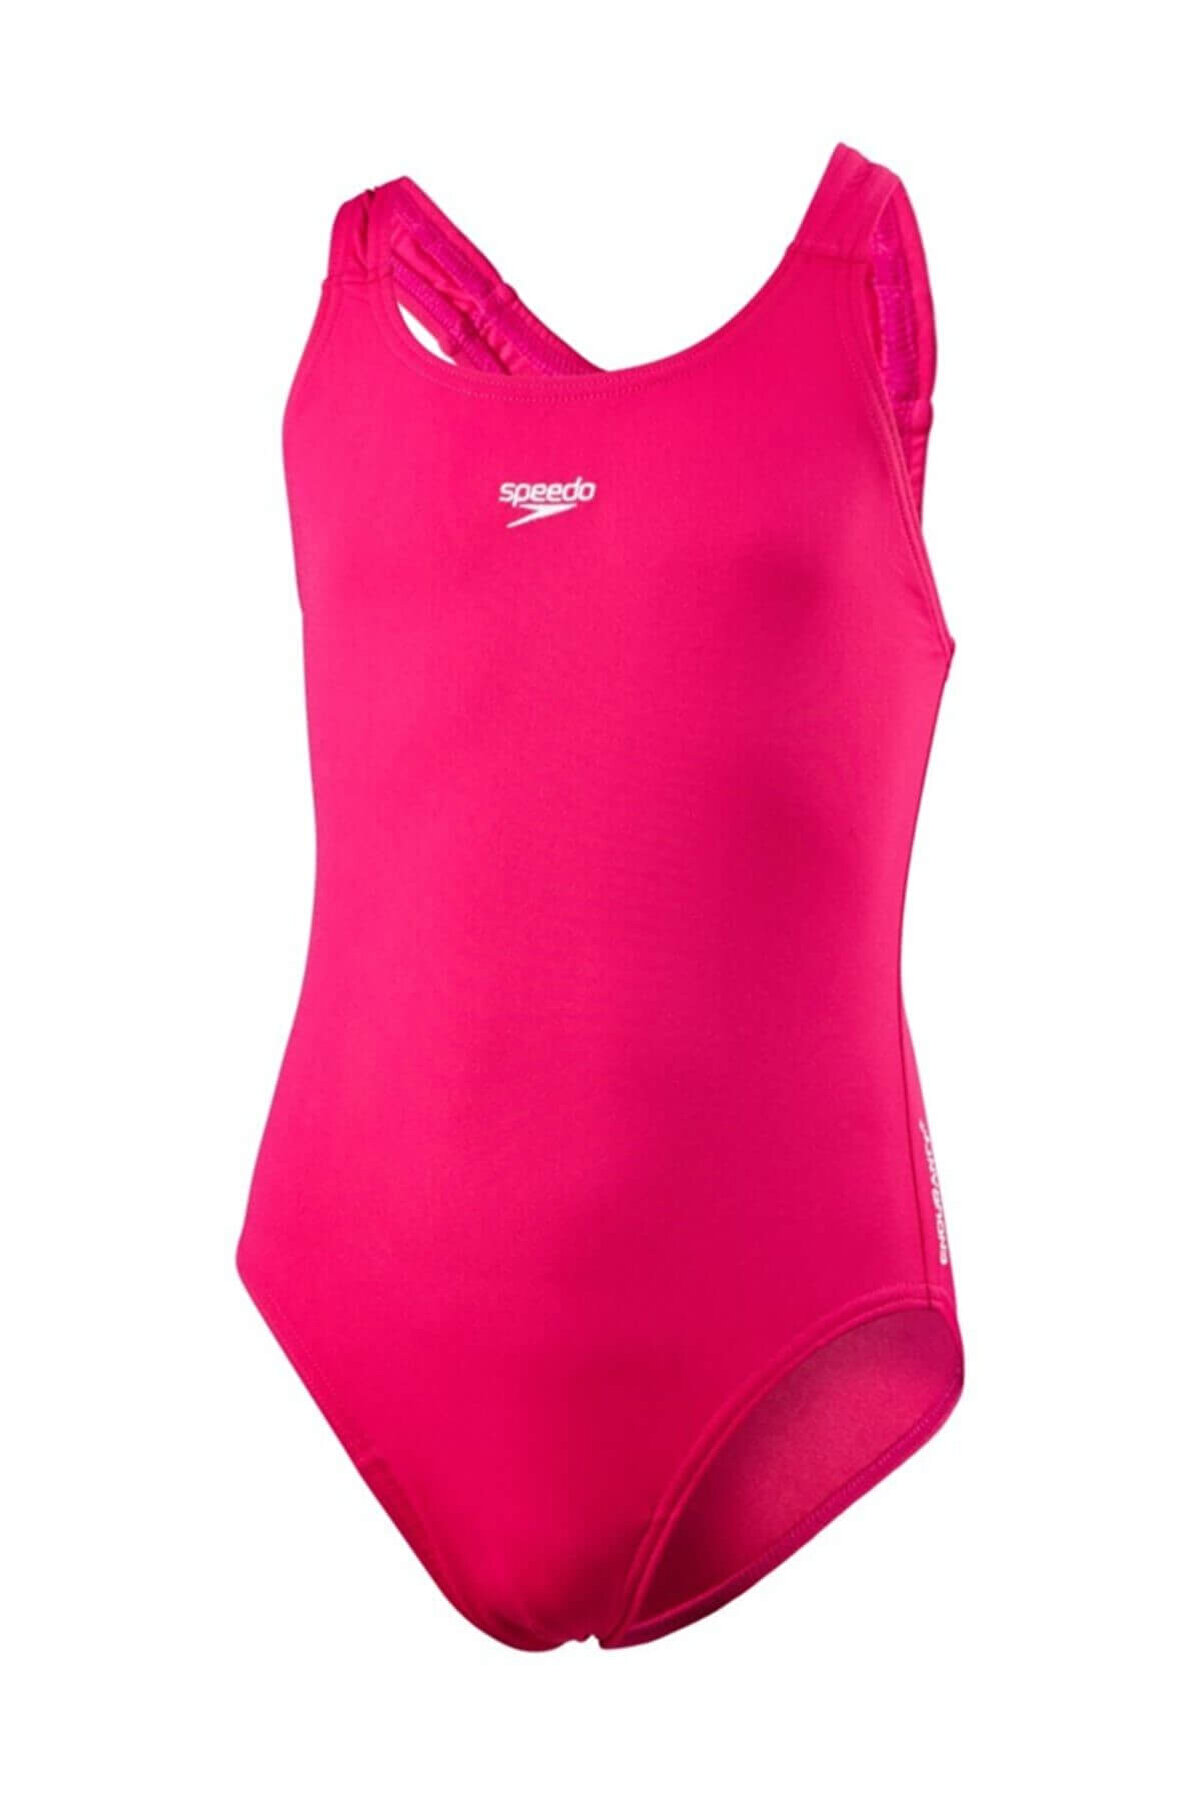 SPEEDO Endurance Plus Kız Çocuk Yüzücü Mayosu